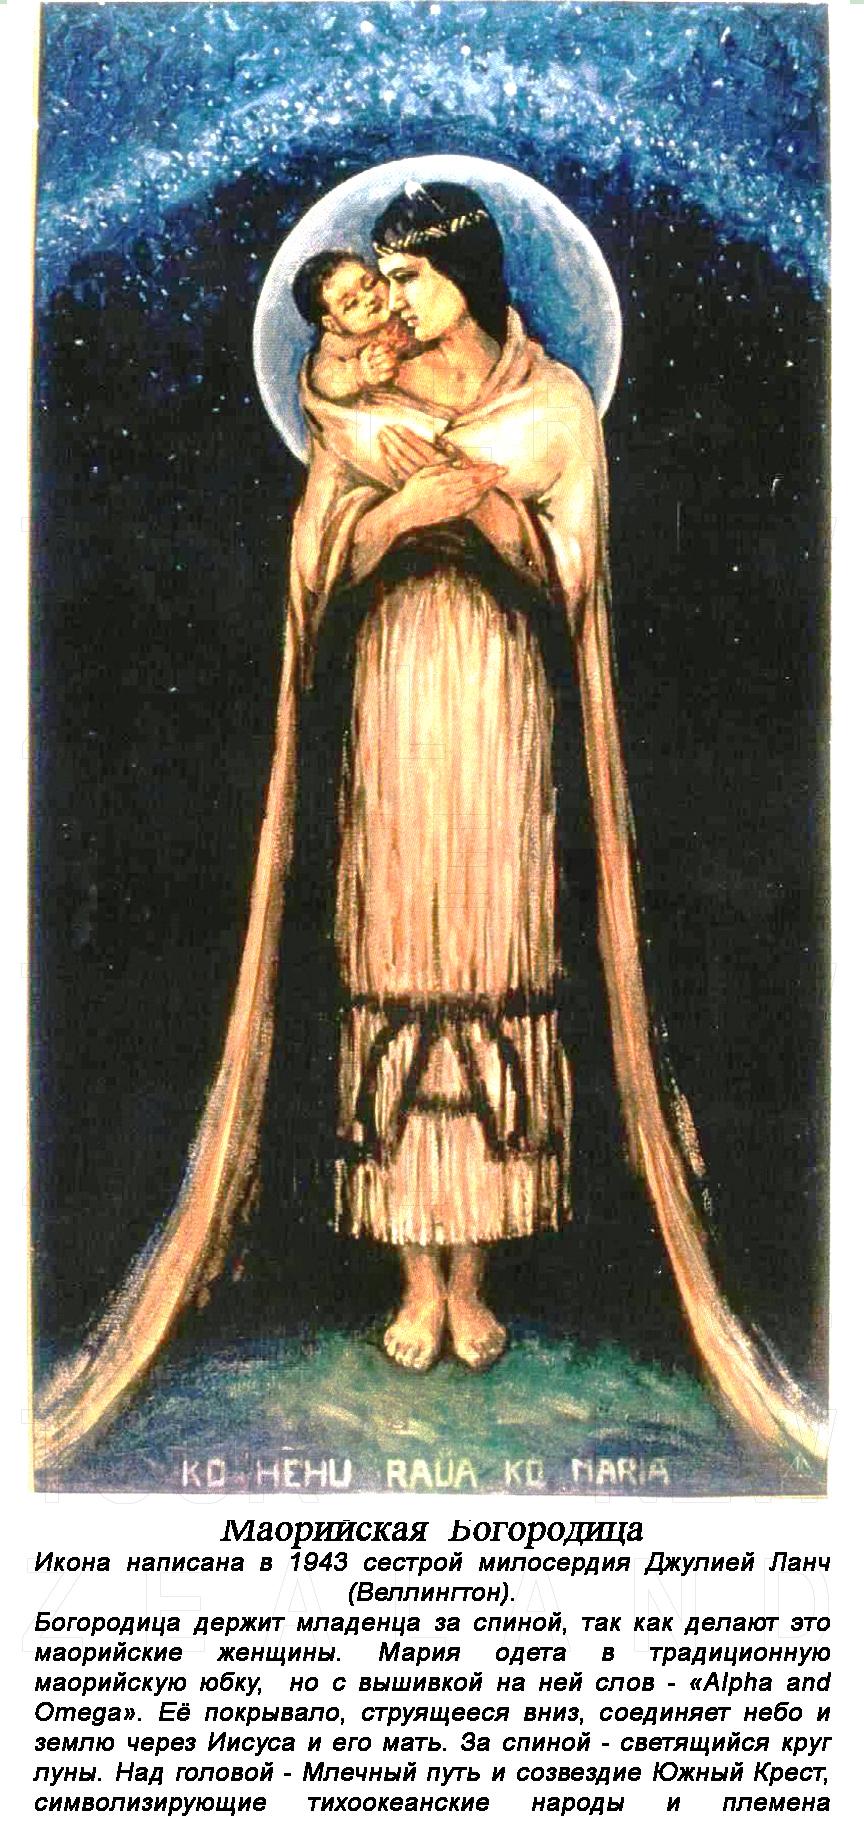 Maori-Madonna